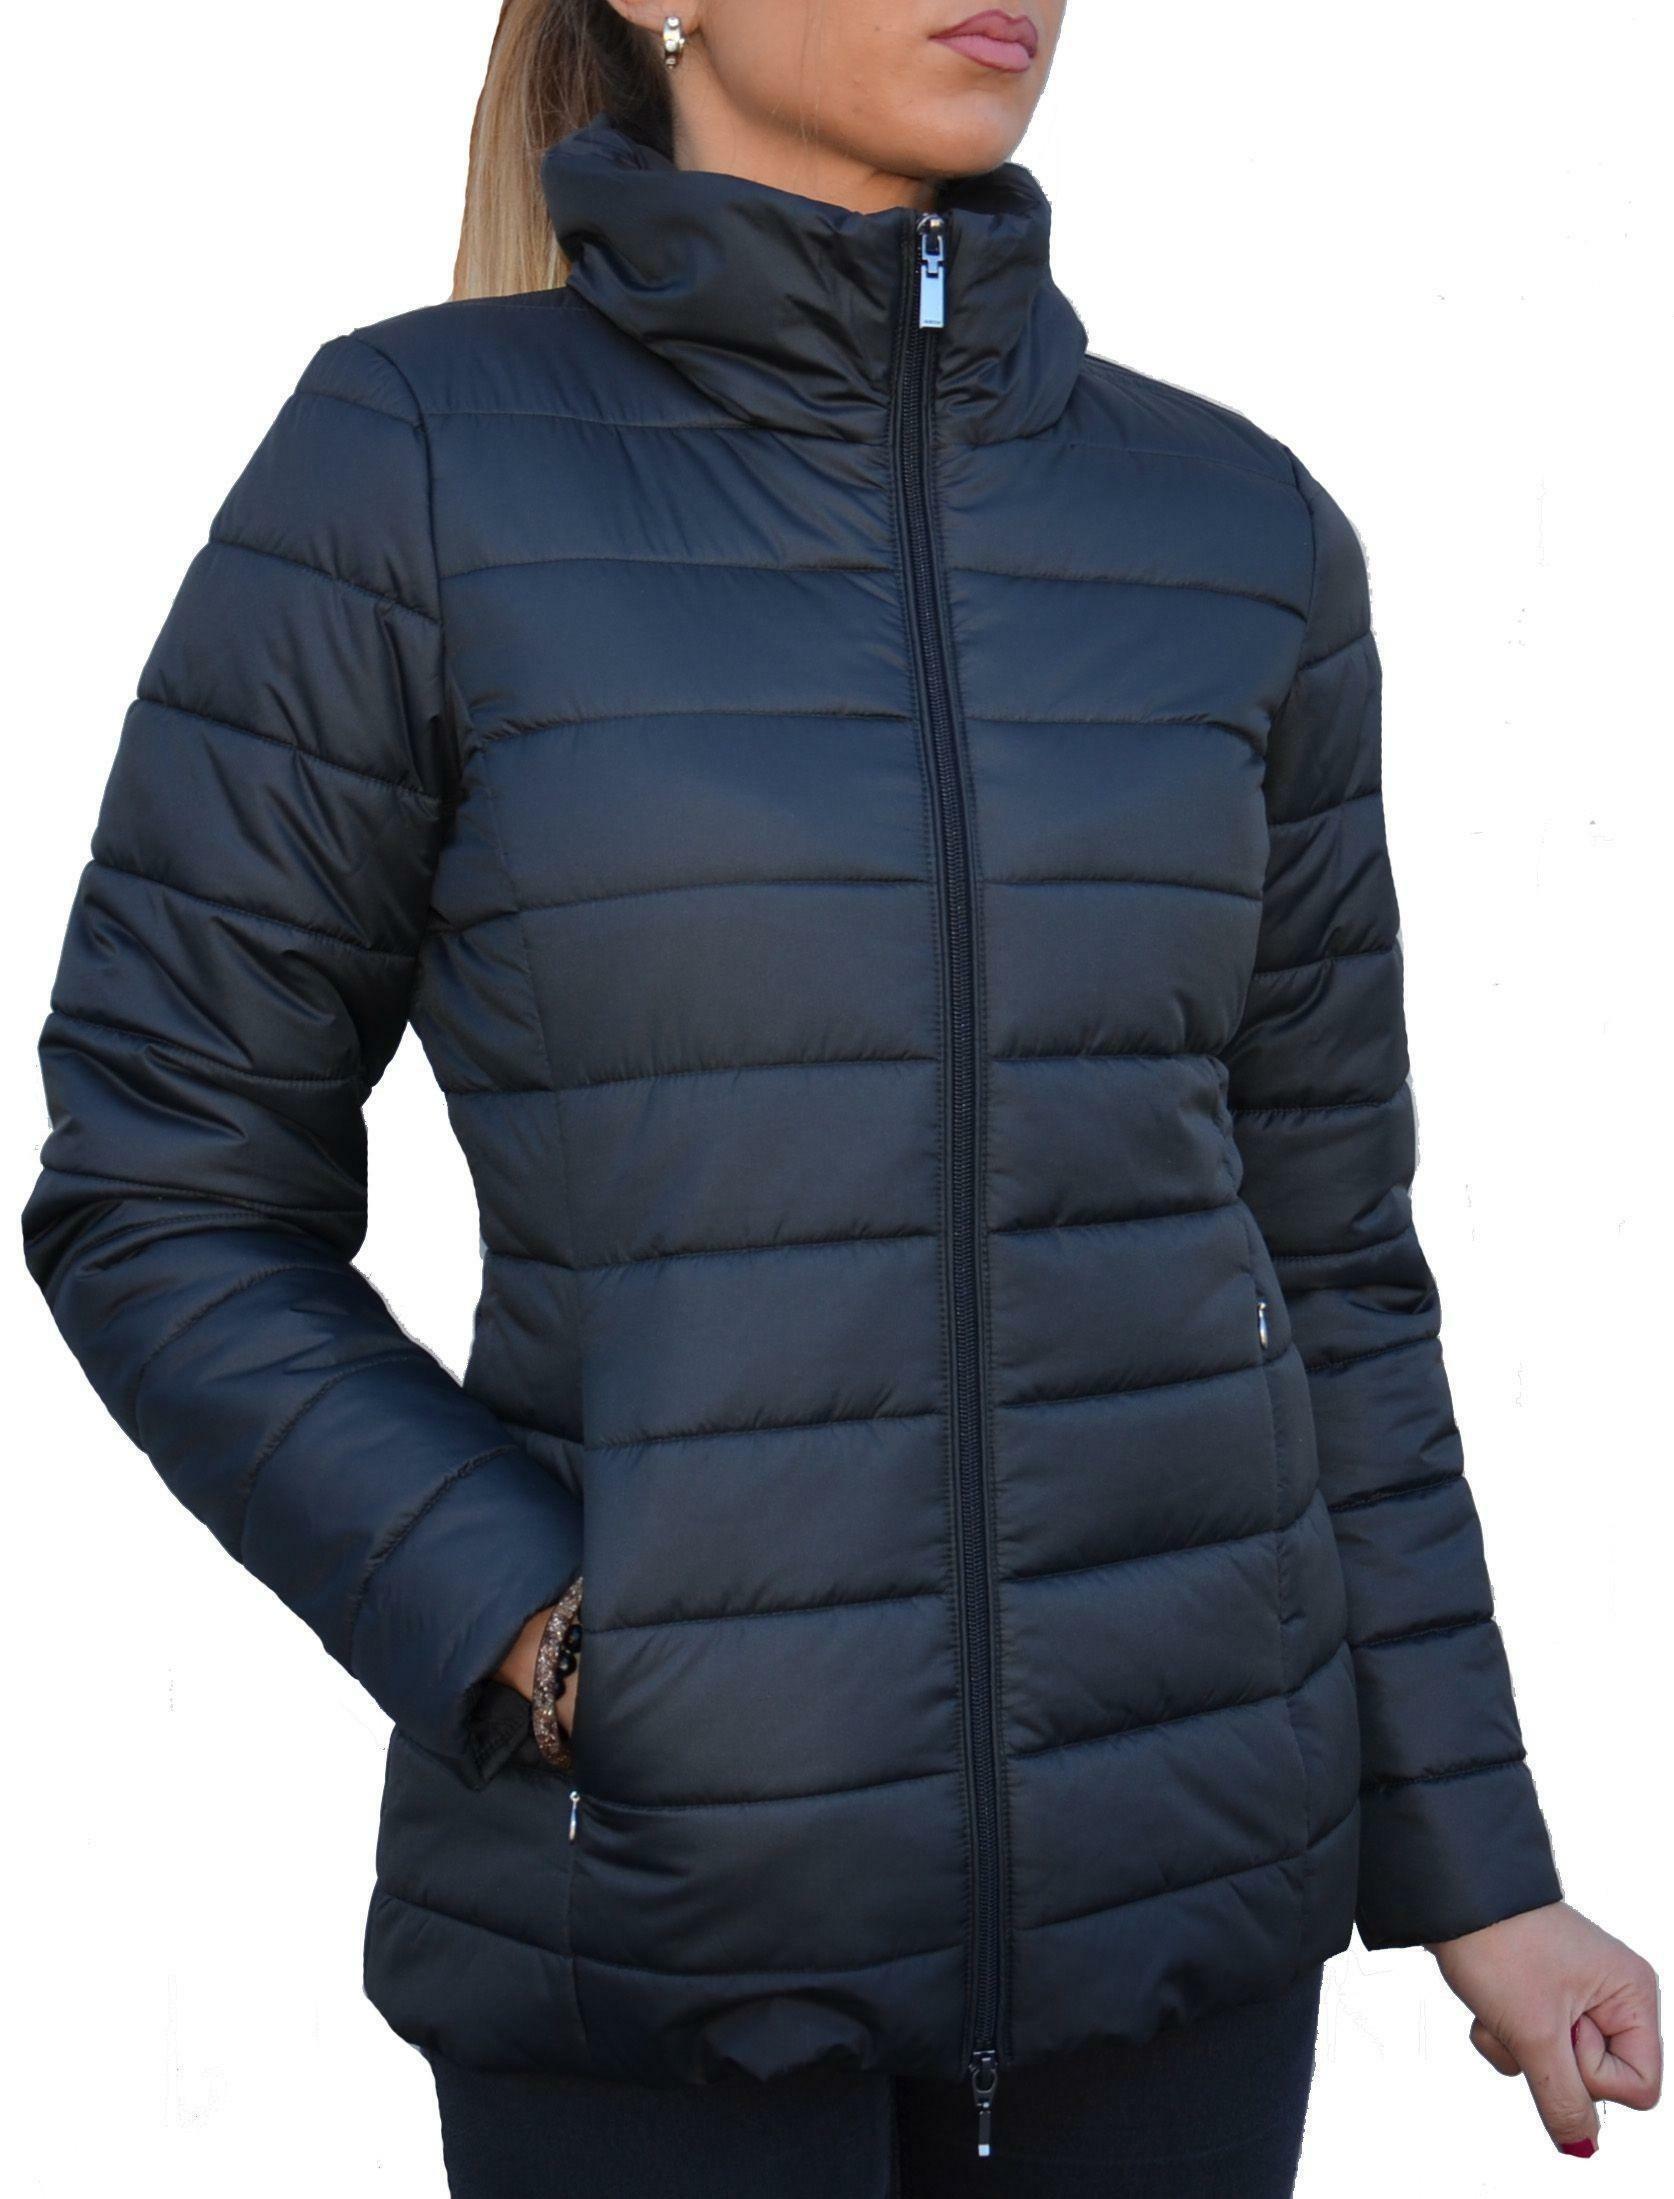 geox geox woman jacket giubbotto donna nero